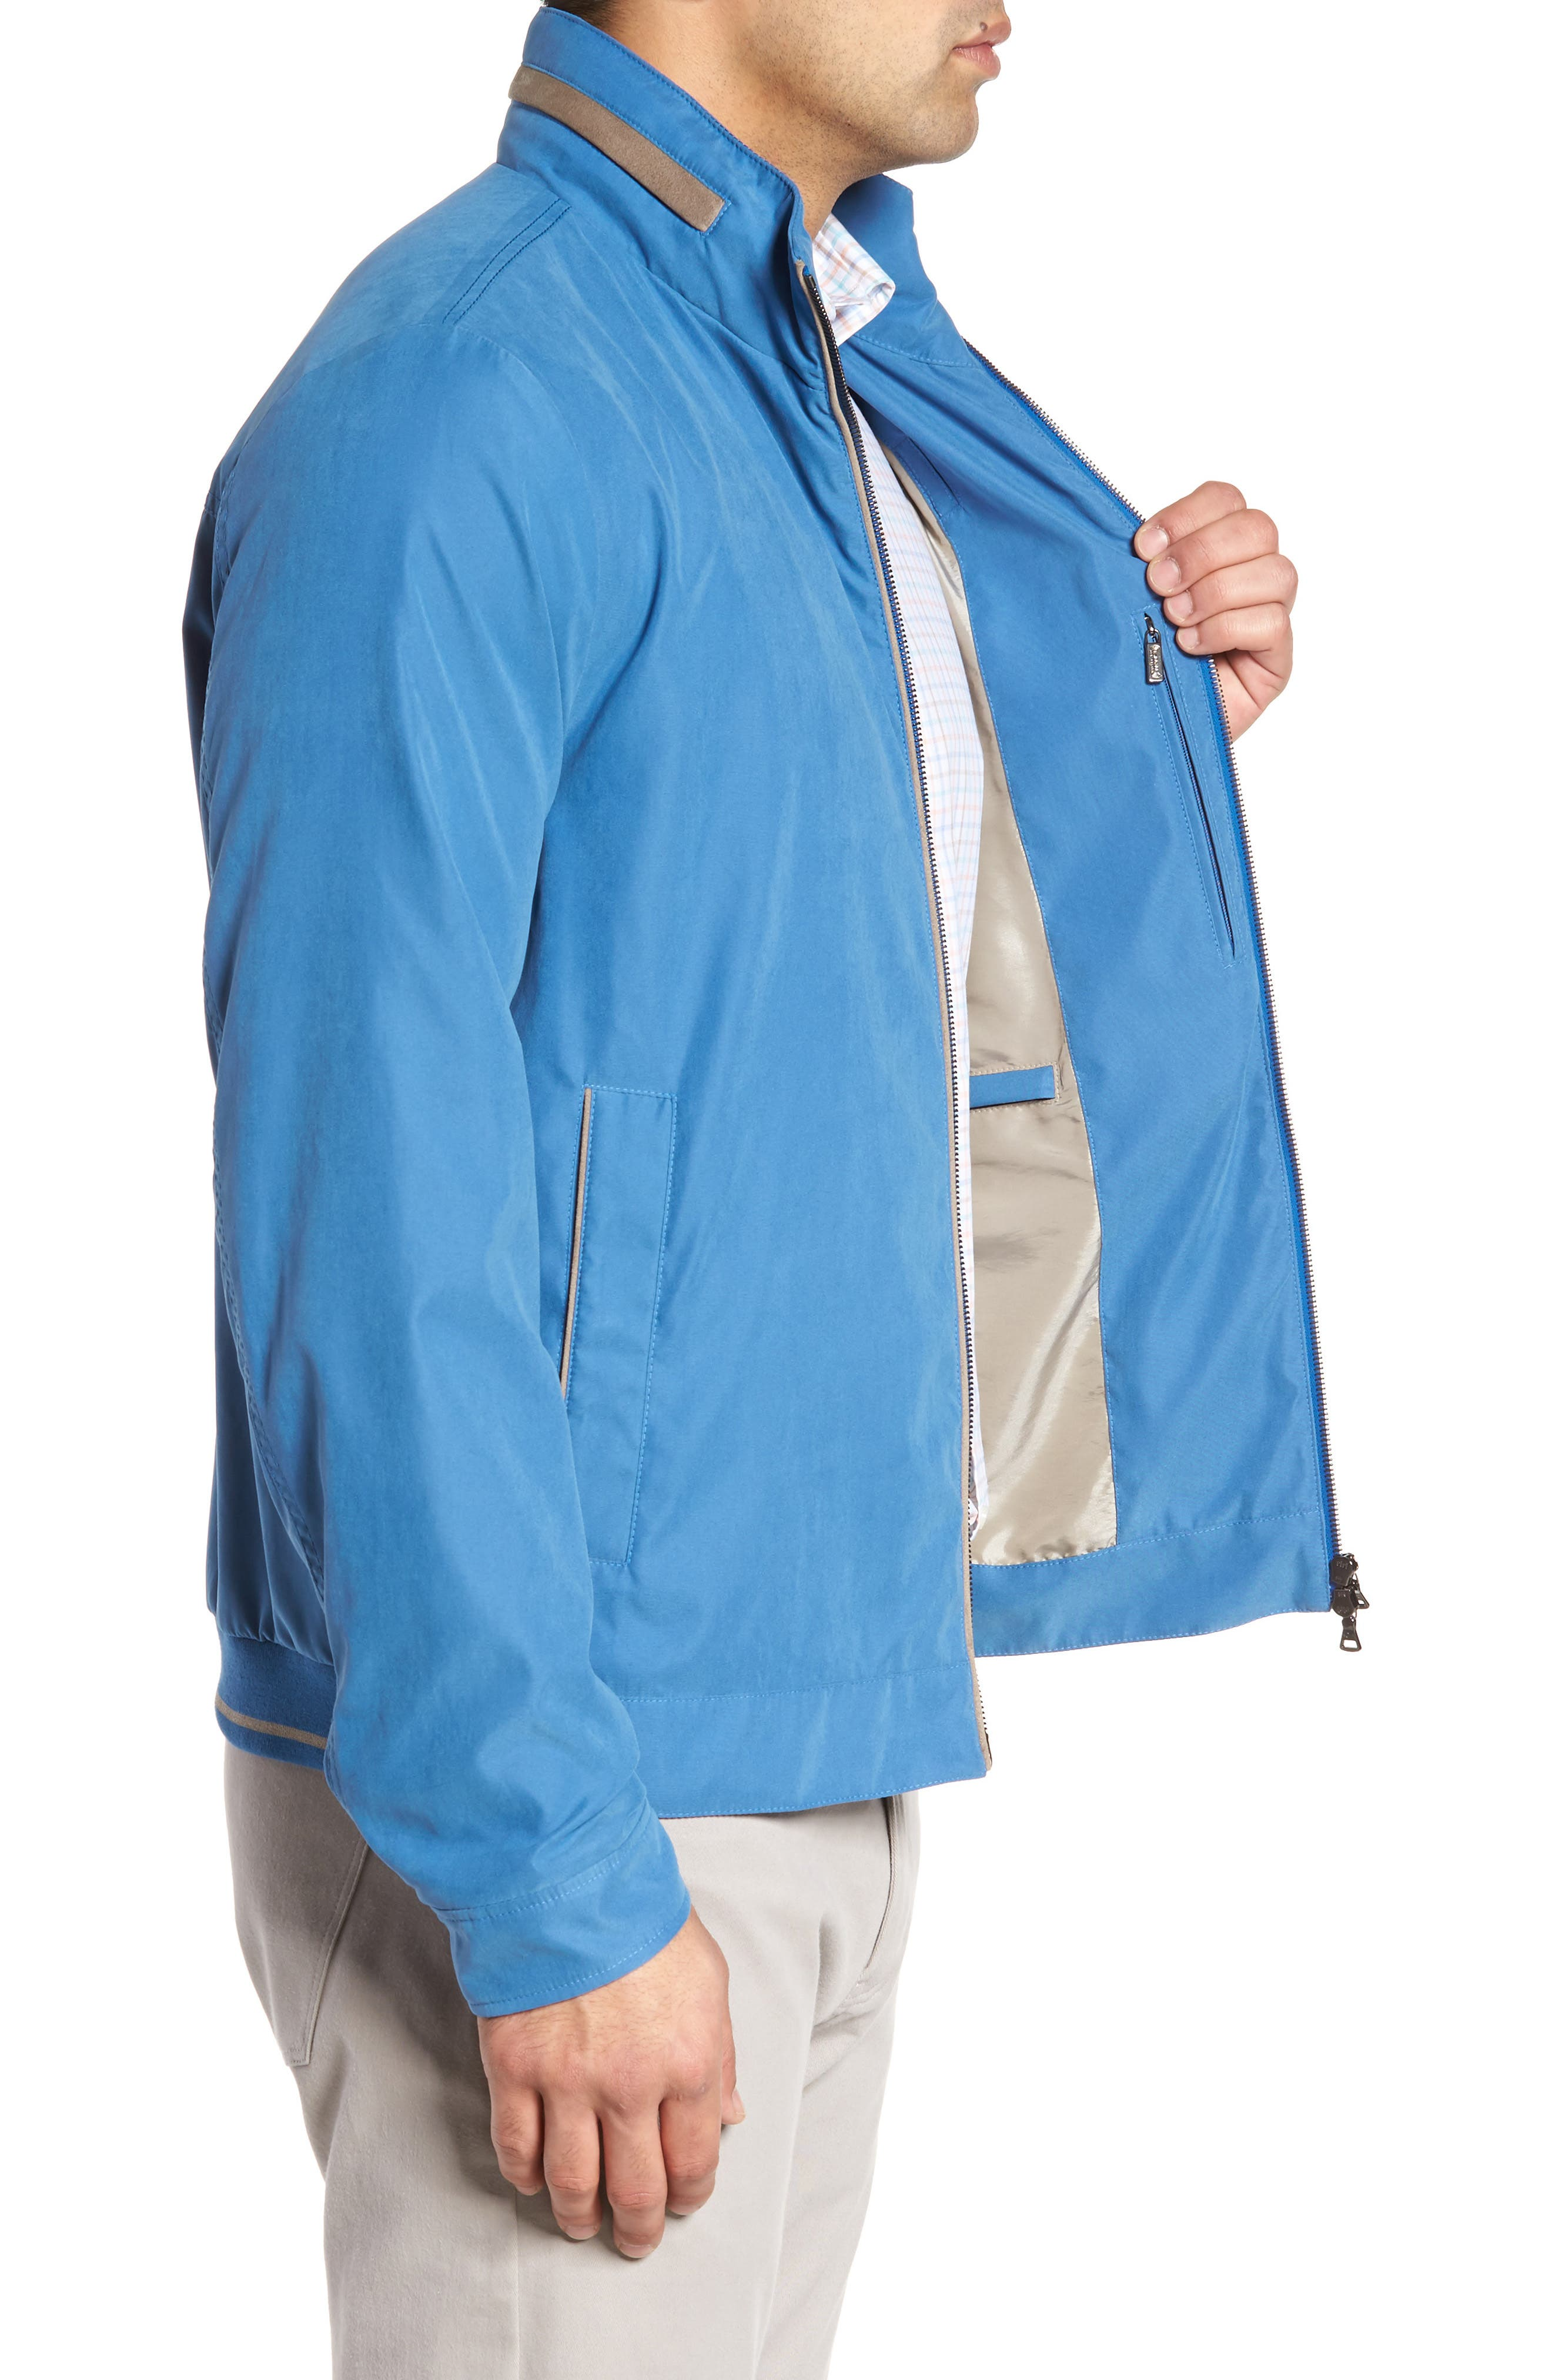 Paul&Shark Water Repellent Microfiber Jacket,                             Alternate thumbnail 3, color,                             Blue